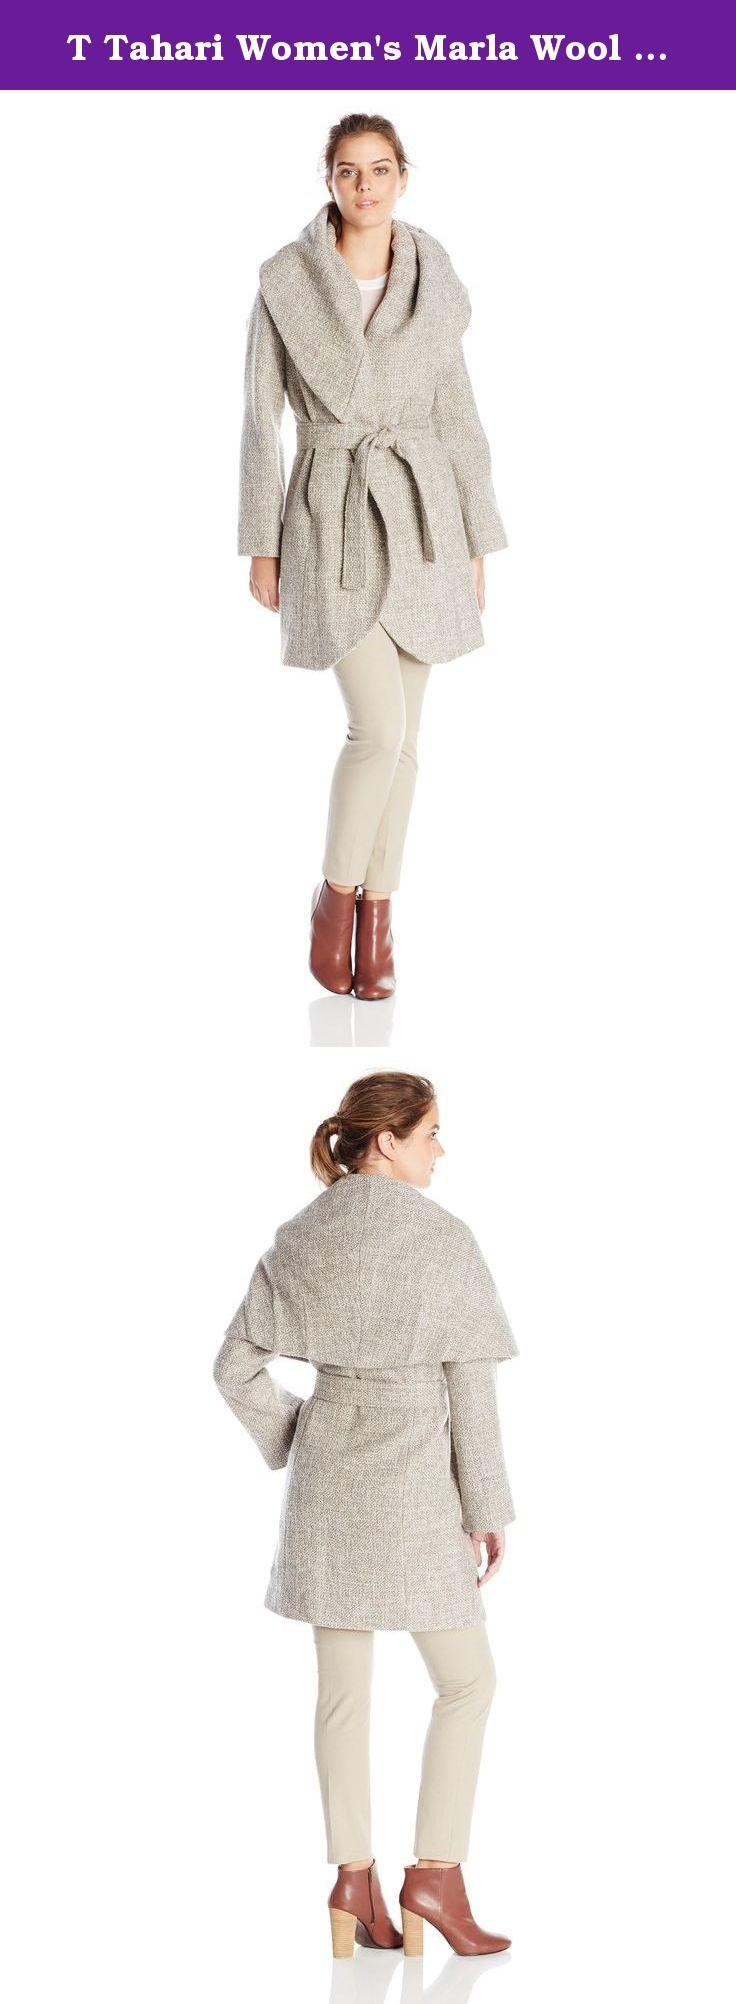 T Tahari Women's Marla Wool Tweed Wrap Coat, Mink/Macrame, Large ...